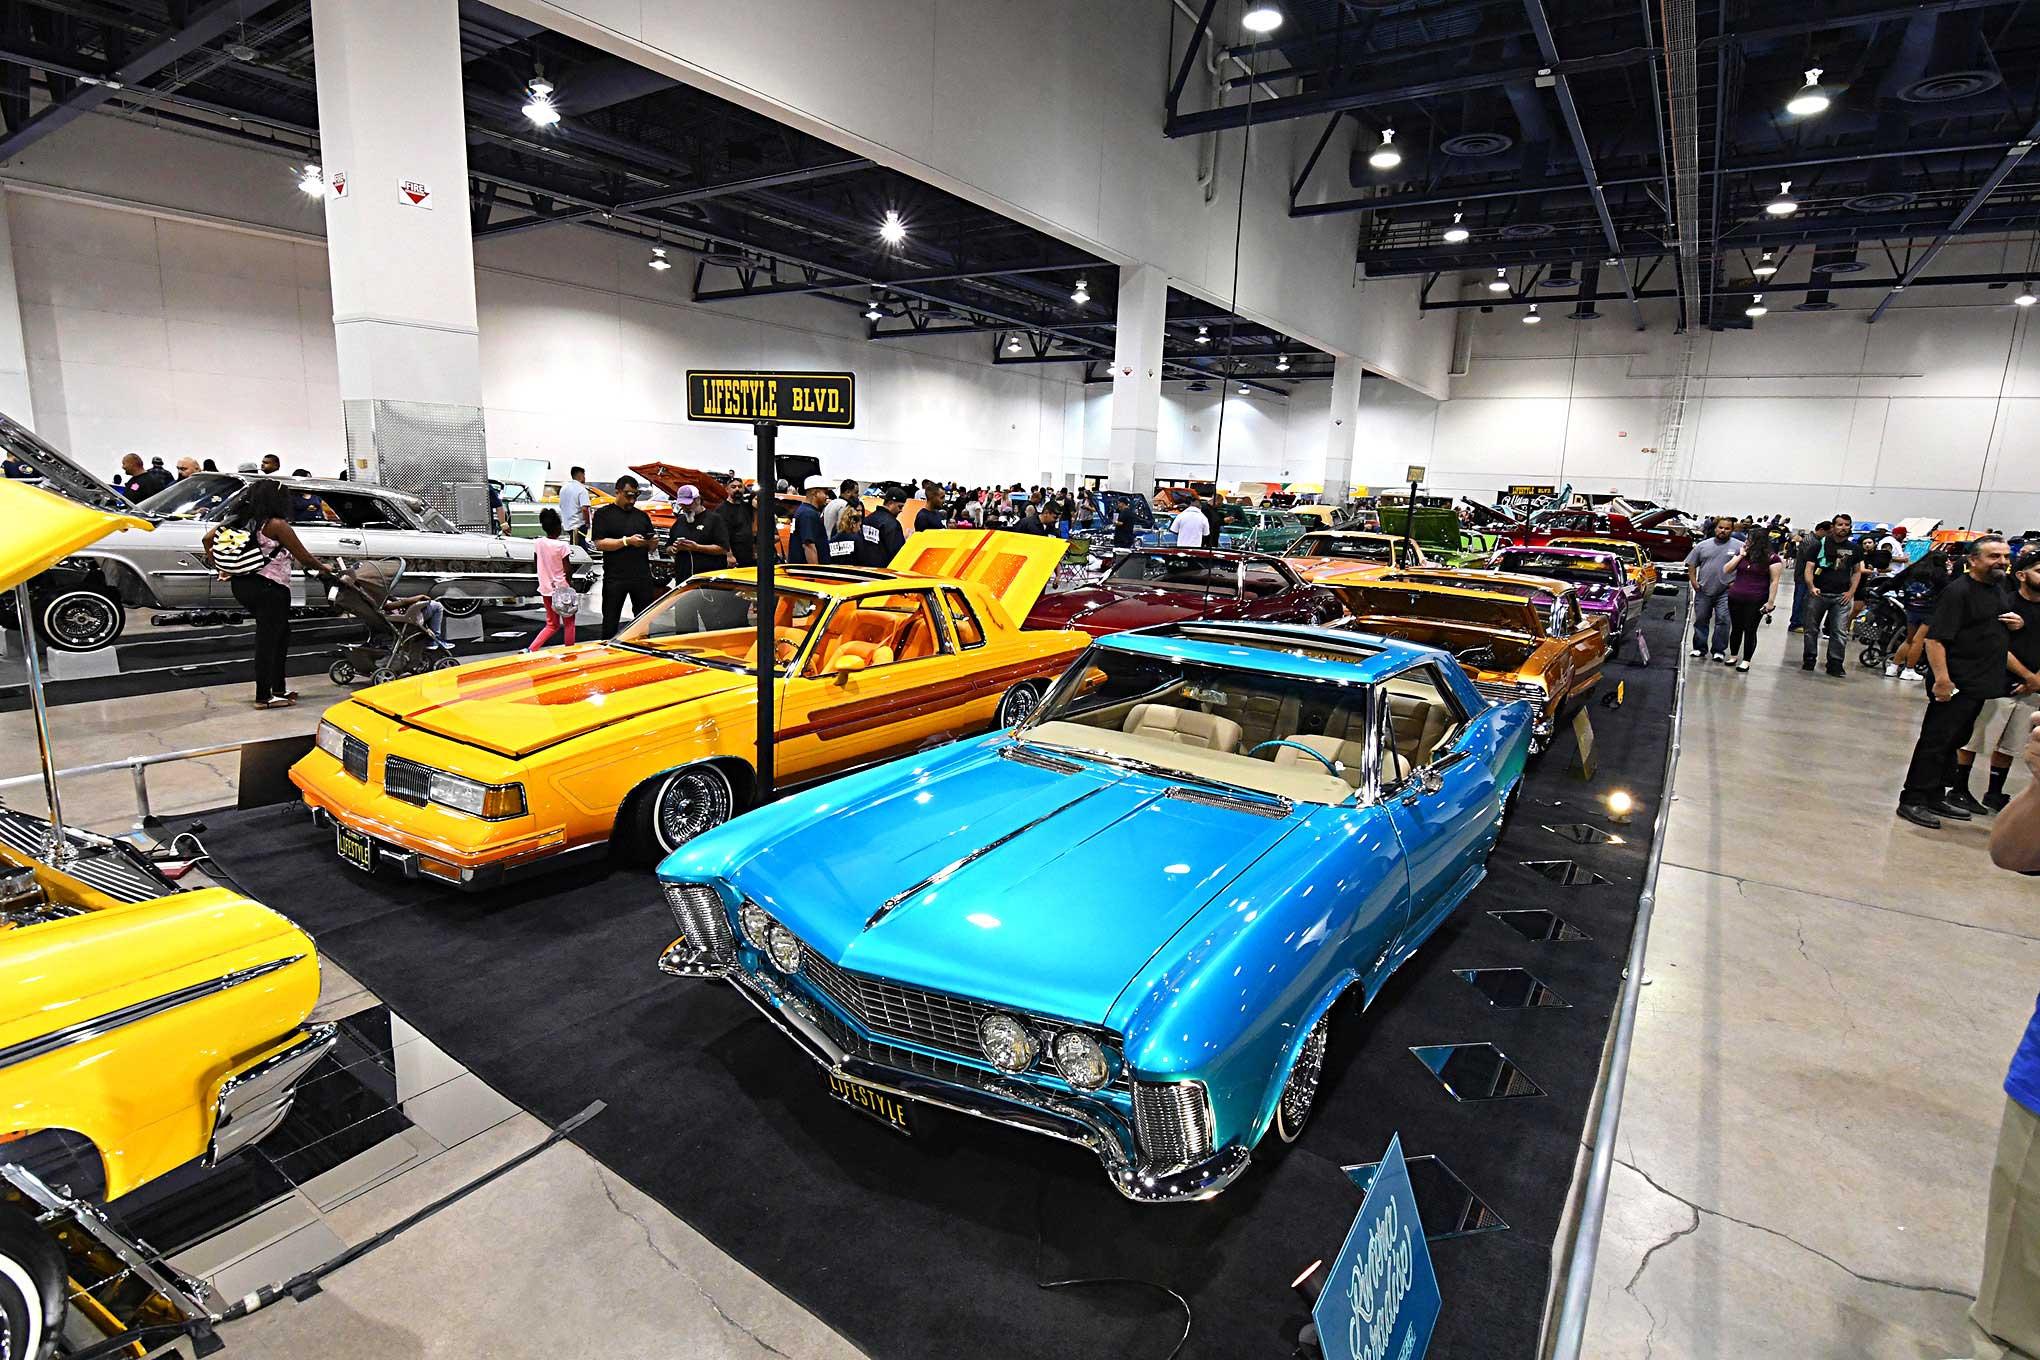 2017 Las Vegas Super Show Lifestyle Car Club Cars - Lowrider